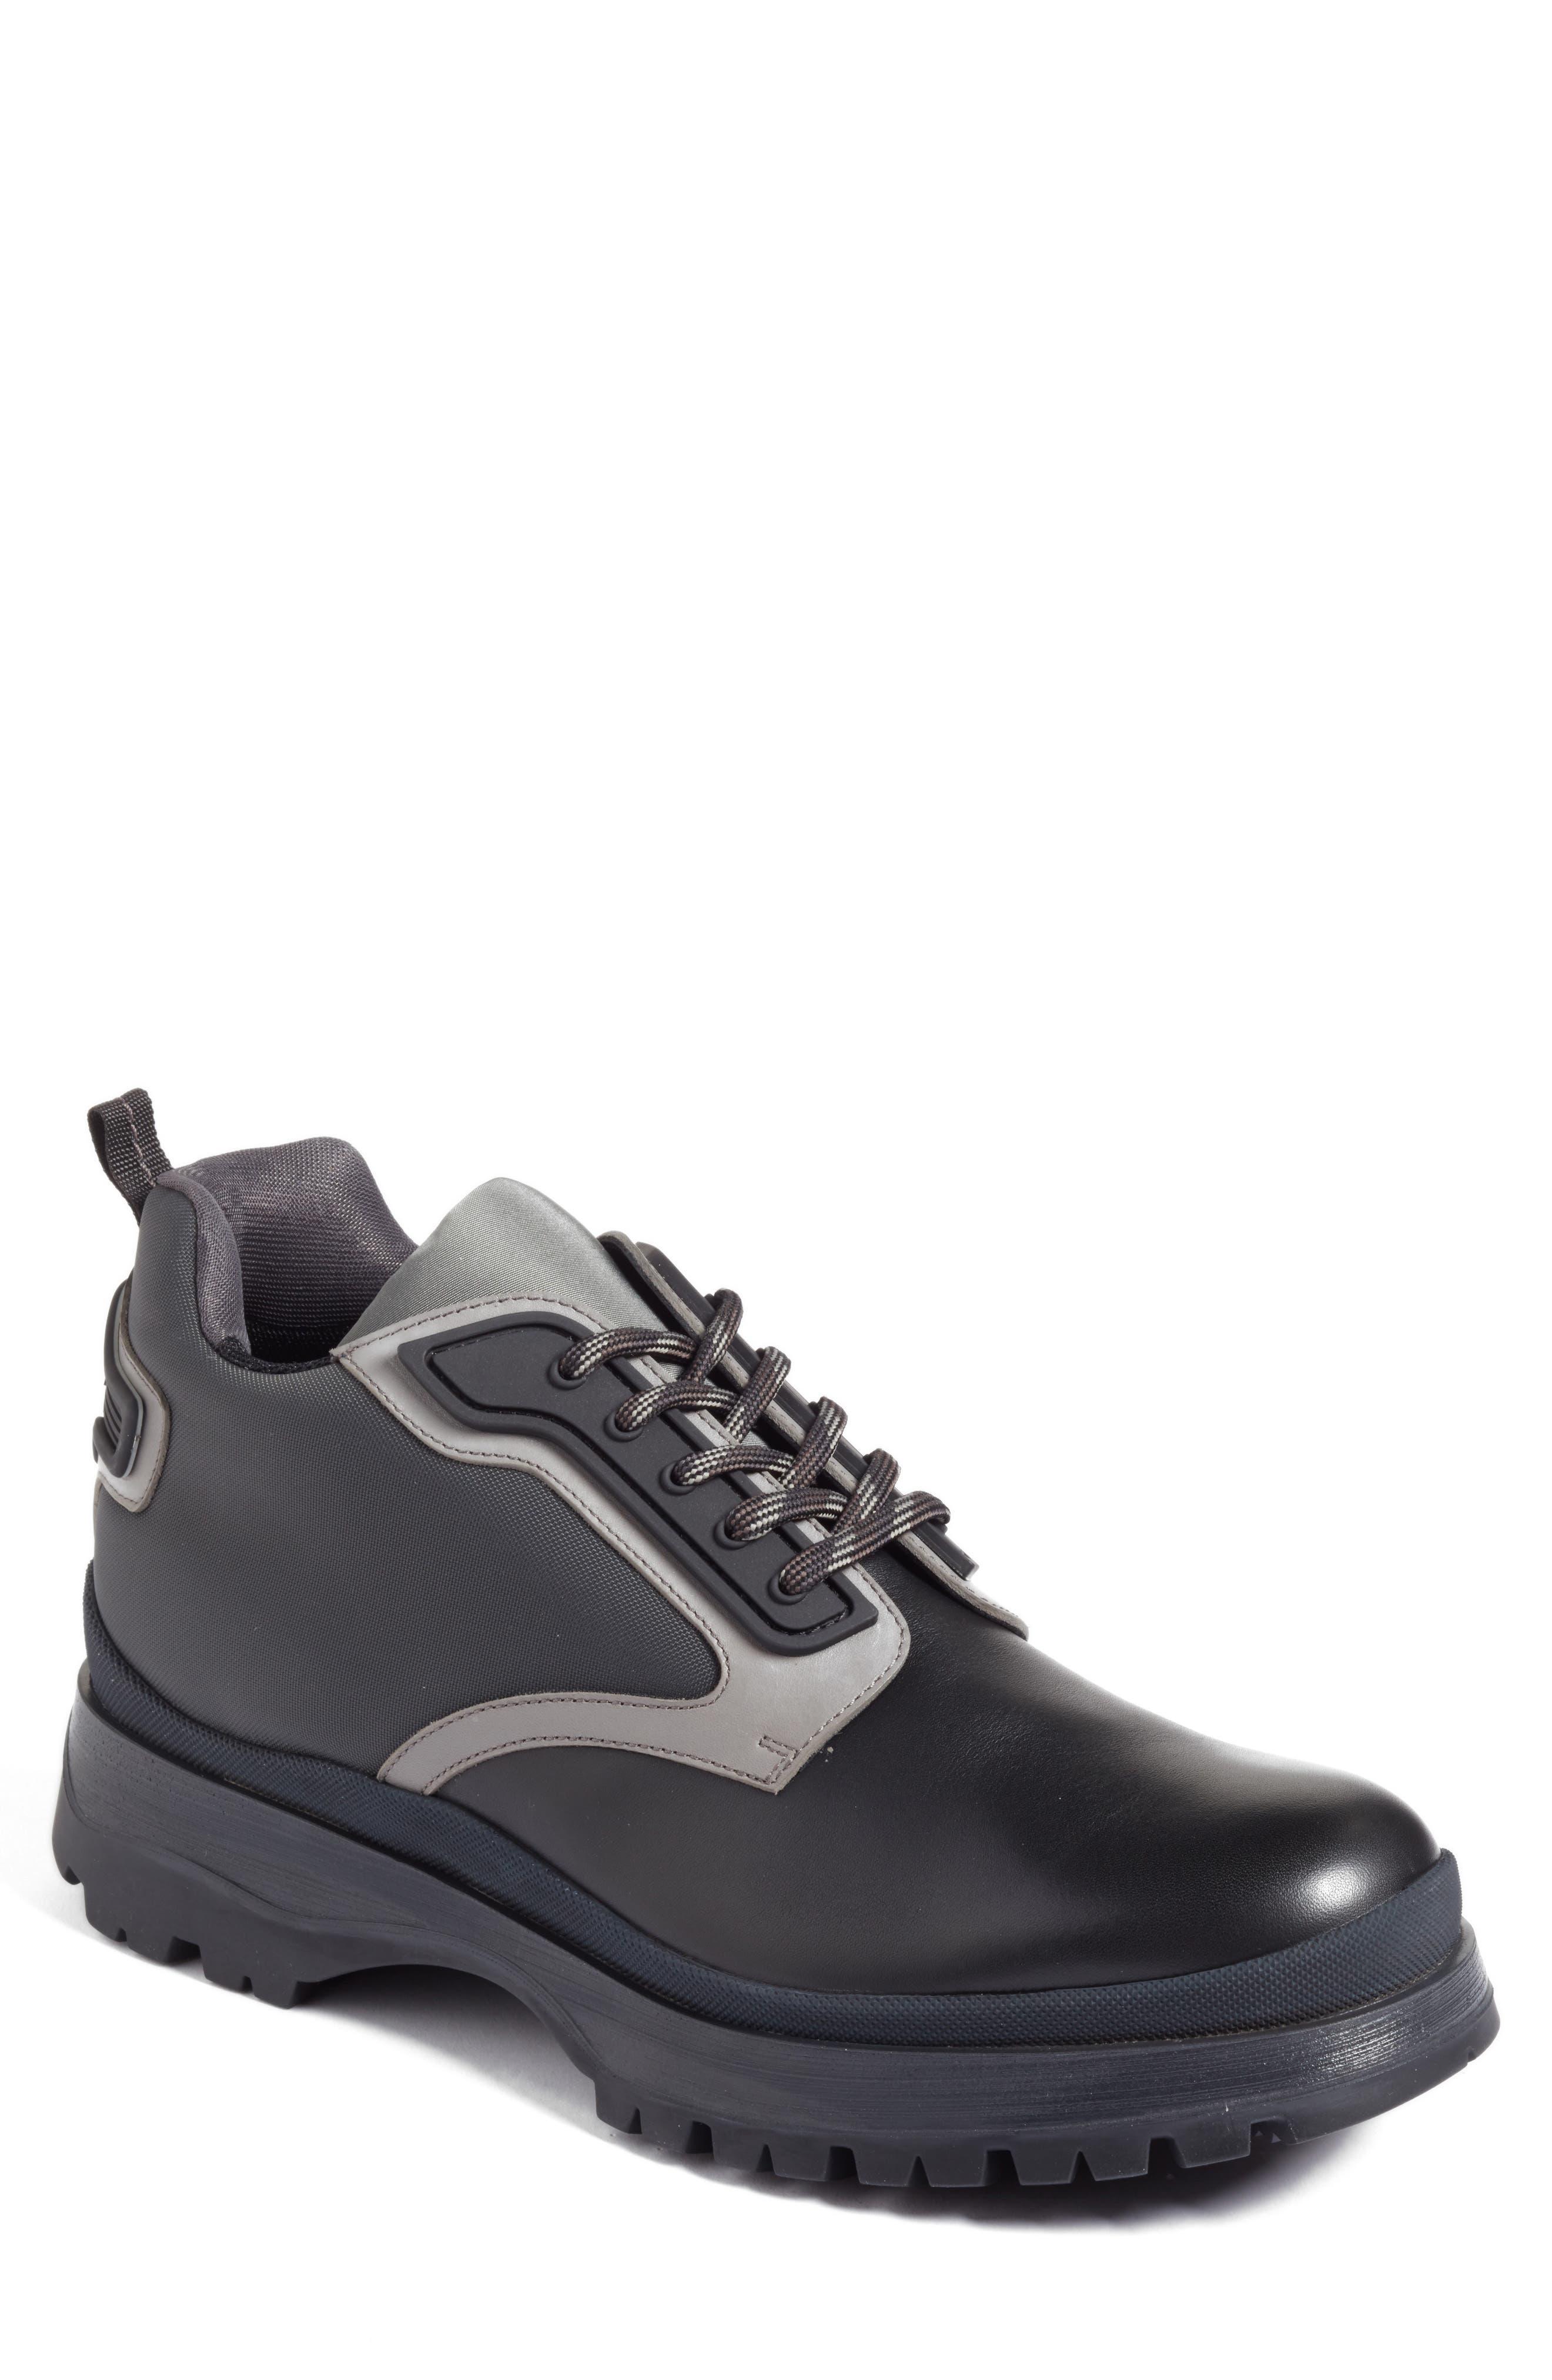 Alternate Image 1 Selected - Prada Linea Rossa Tech Sneaker Boot (Men)